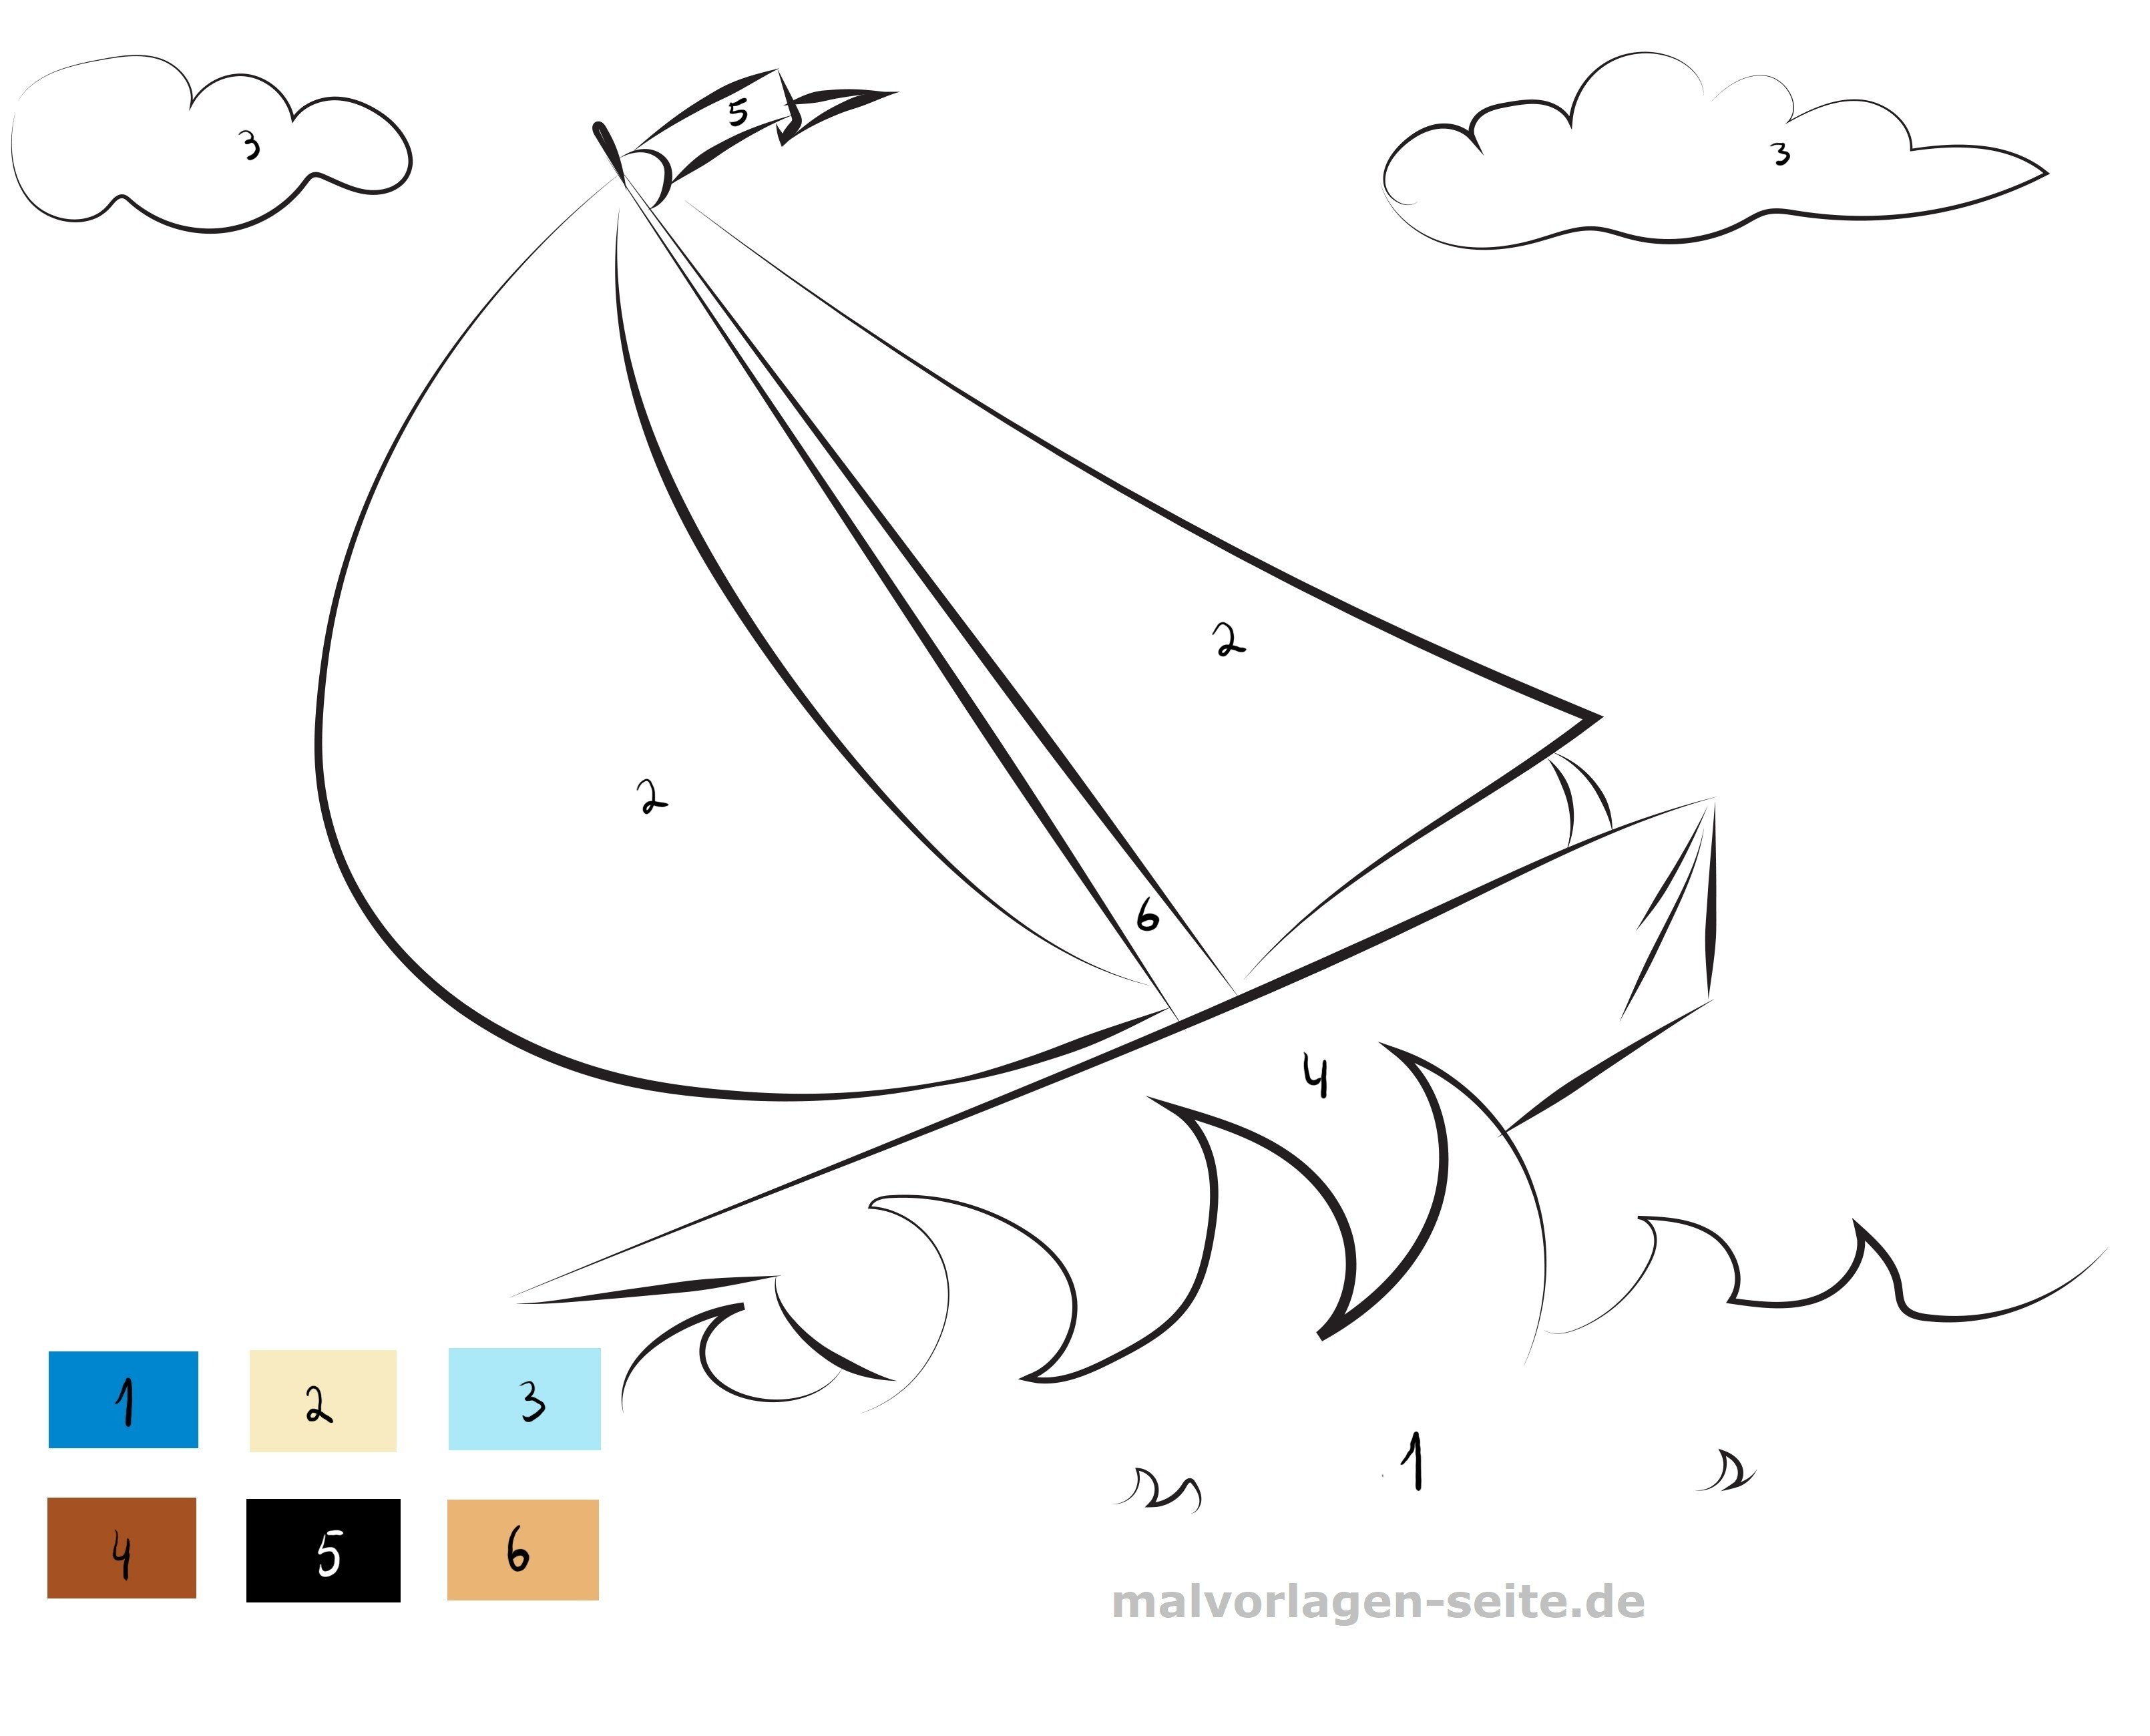 259 malvorlage piratenschiff  coloring and malvorlagan